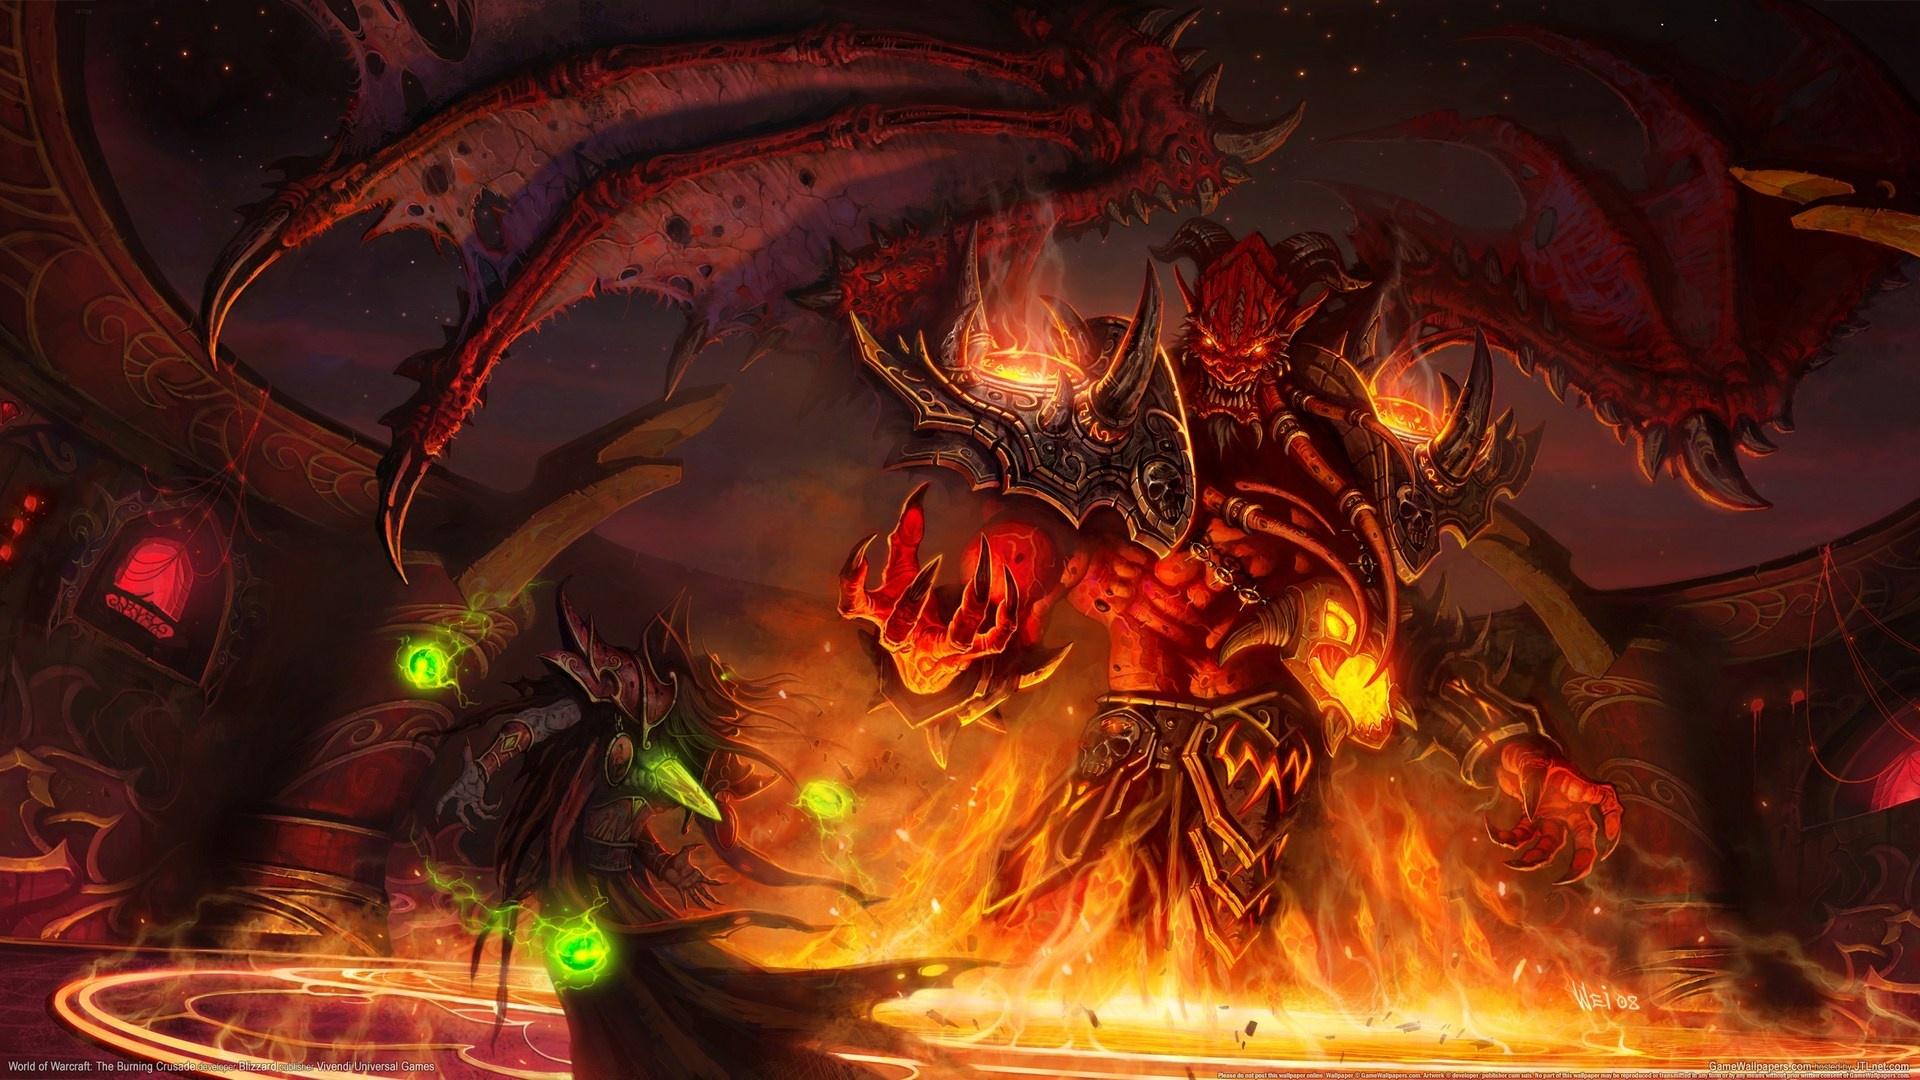 Wallpaper World Of Warcraft The Burning Crusade 1920x1080 Full Hd